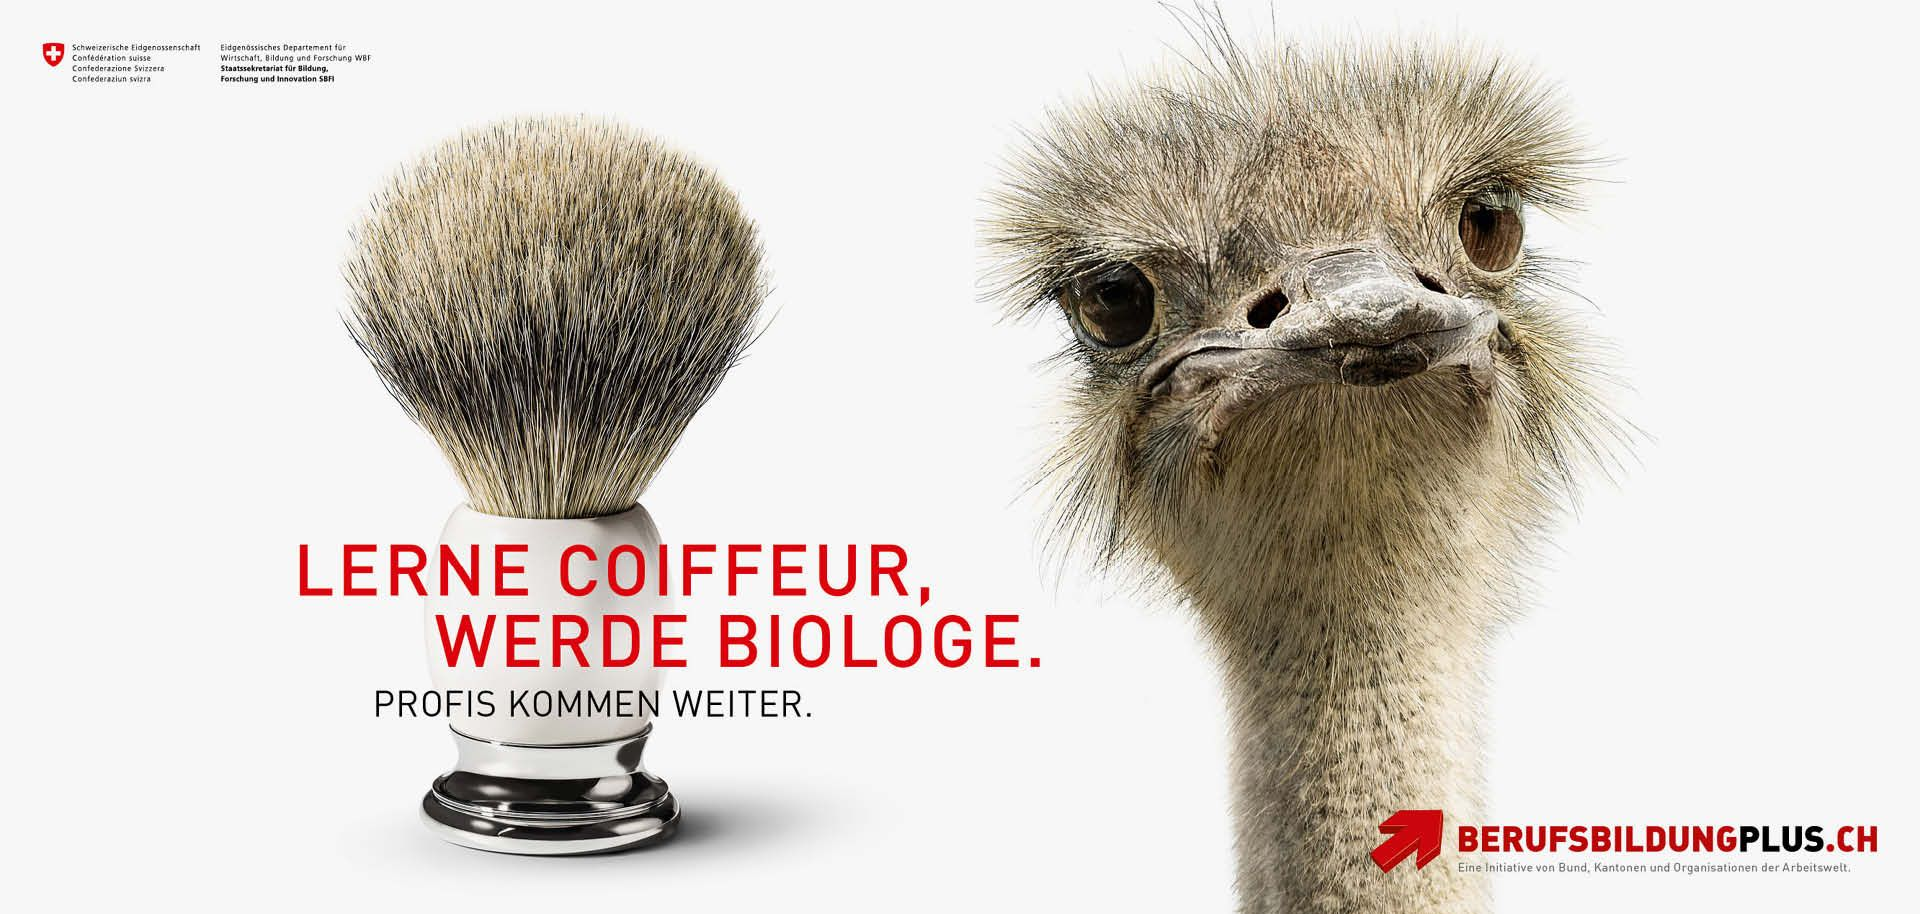 cr Basel Werbeagentur sbfi berufsbildungplus imagekampagne